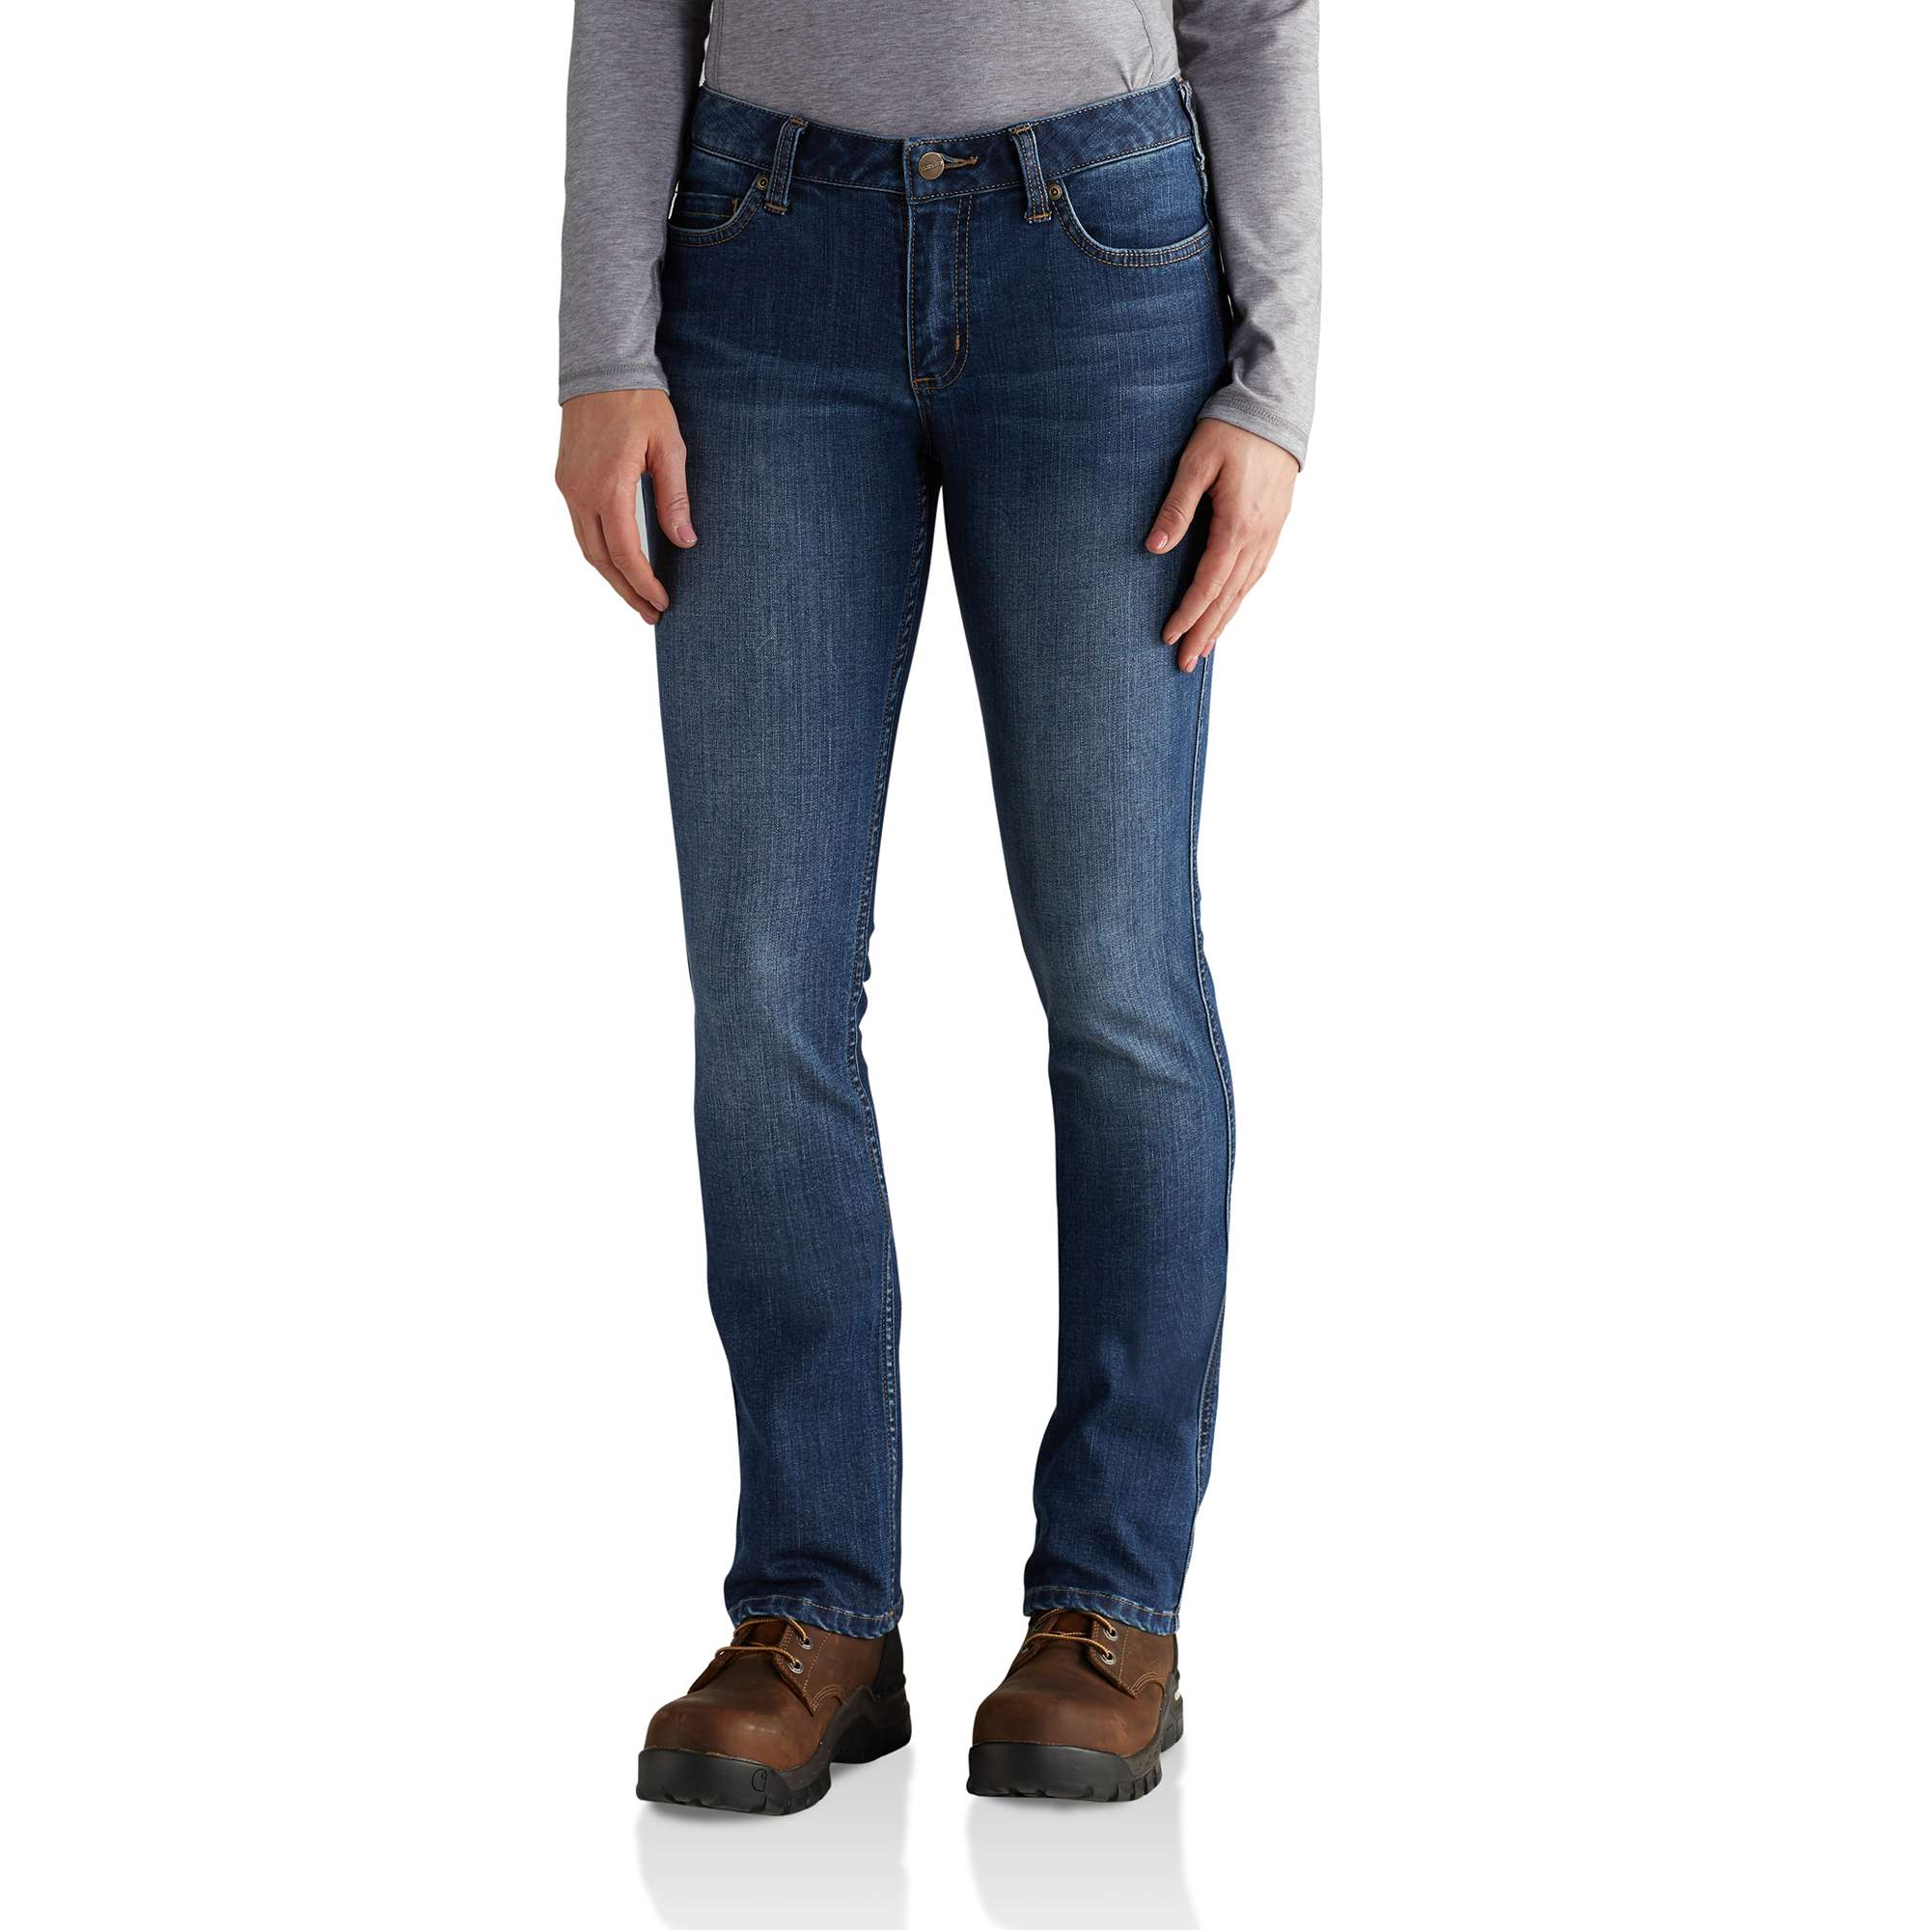 Carhartt Slim-Fit Layton Bootcut Jean